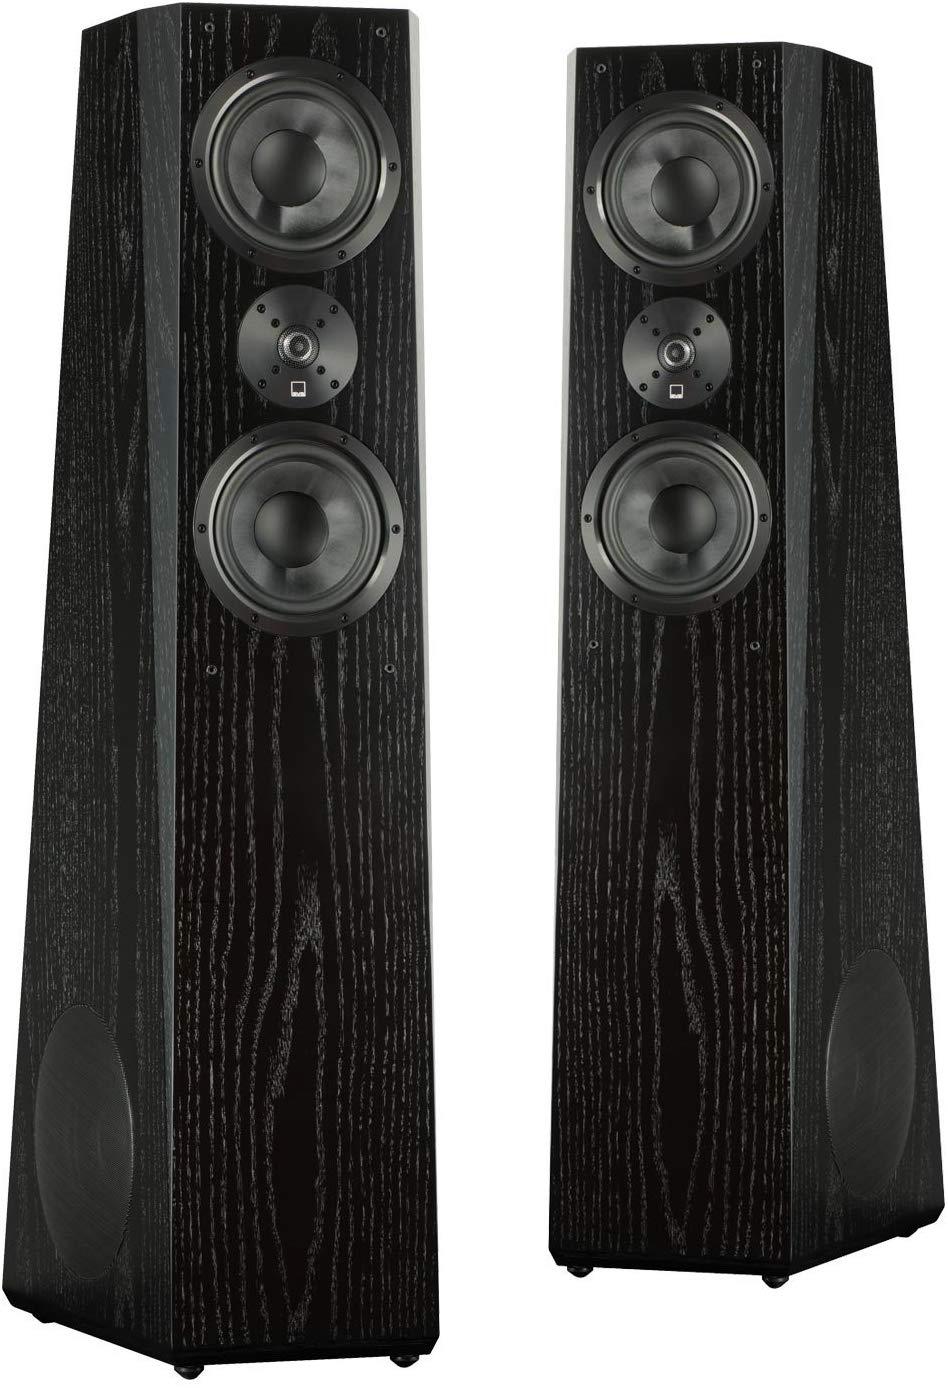 comparing the best floorstanding speakers on the market - SVS Ultra Tower Flagship 3-Way Loudspeaker (Black Oak Pair)